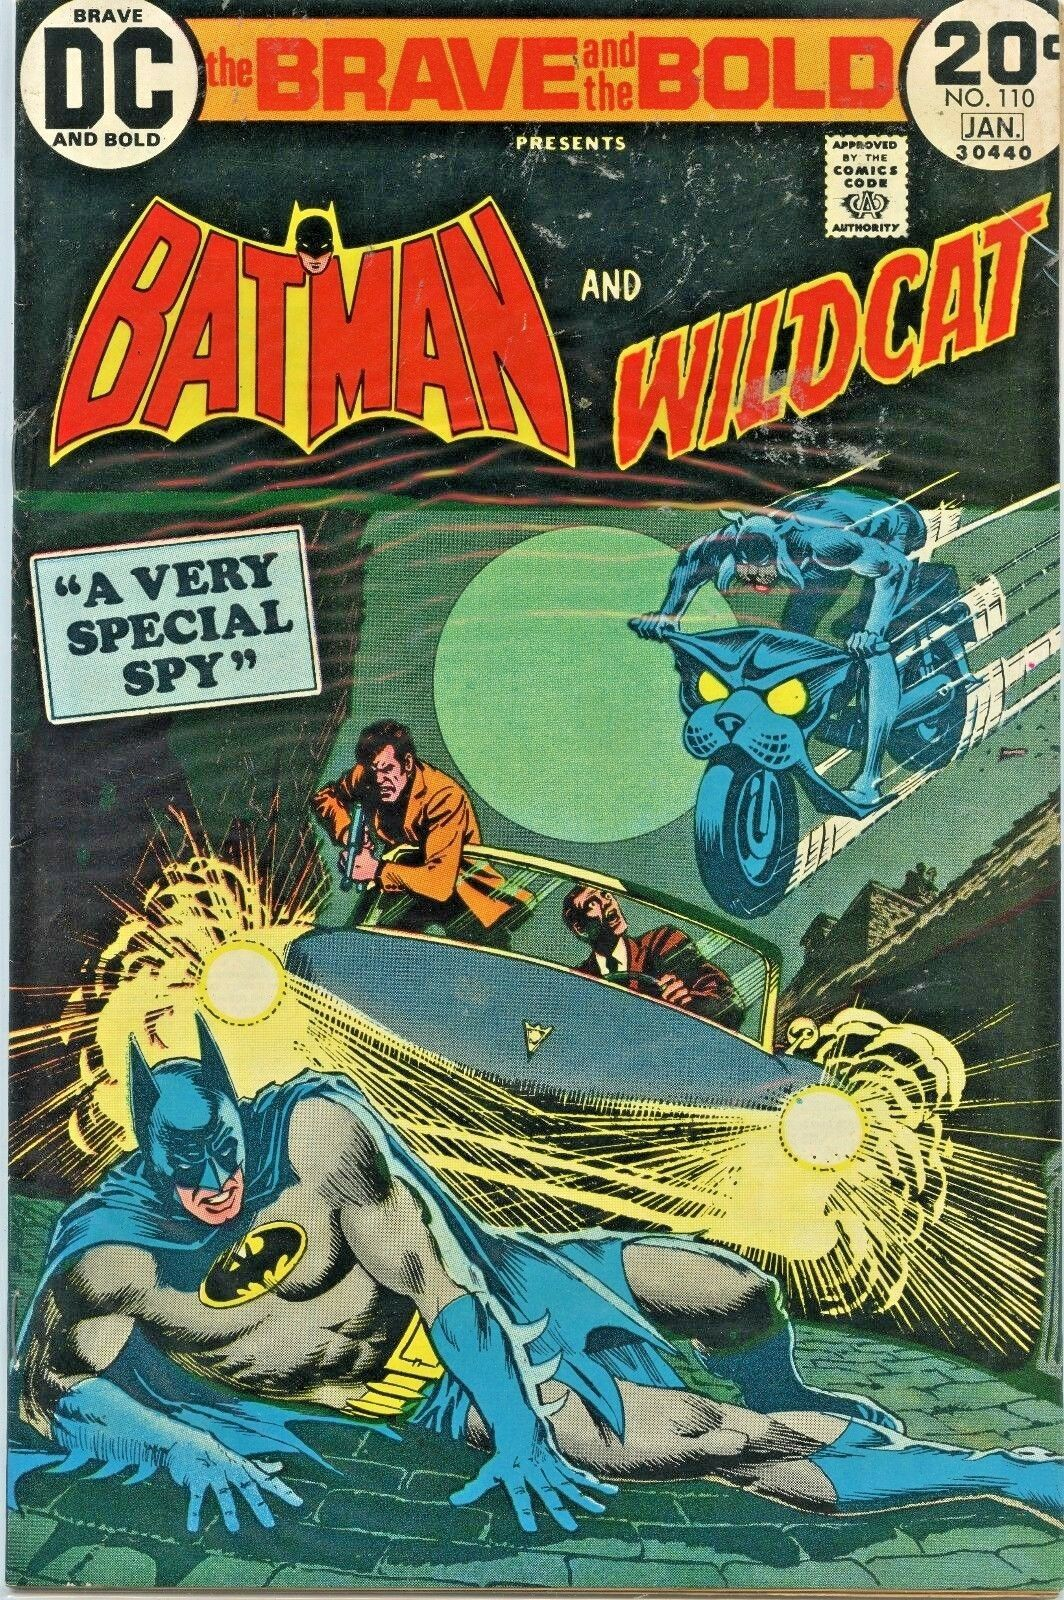 BRAVE AND THE BOLD # 110-120 LOT BATMAN JOKER METAL MEN AQUAMAN DR FATE DC